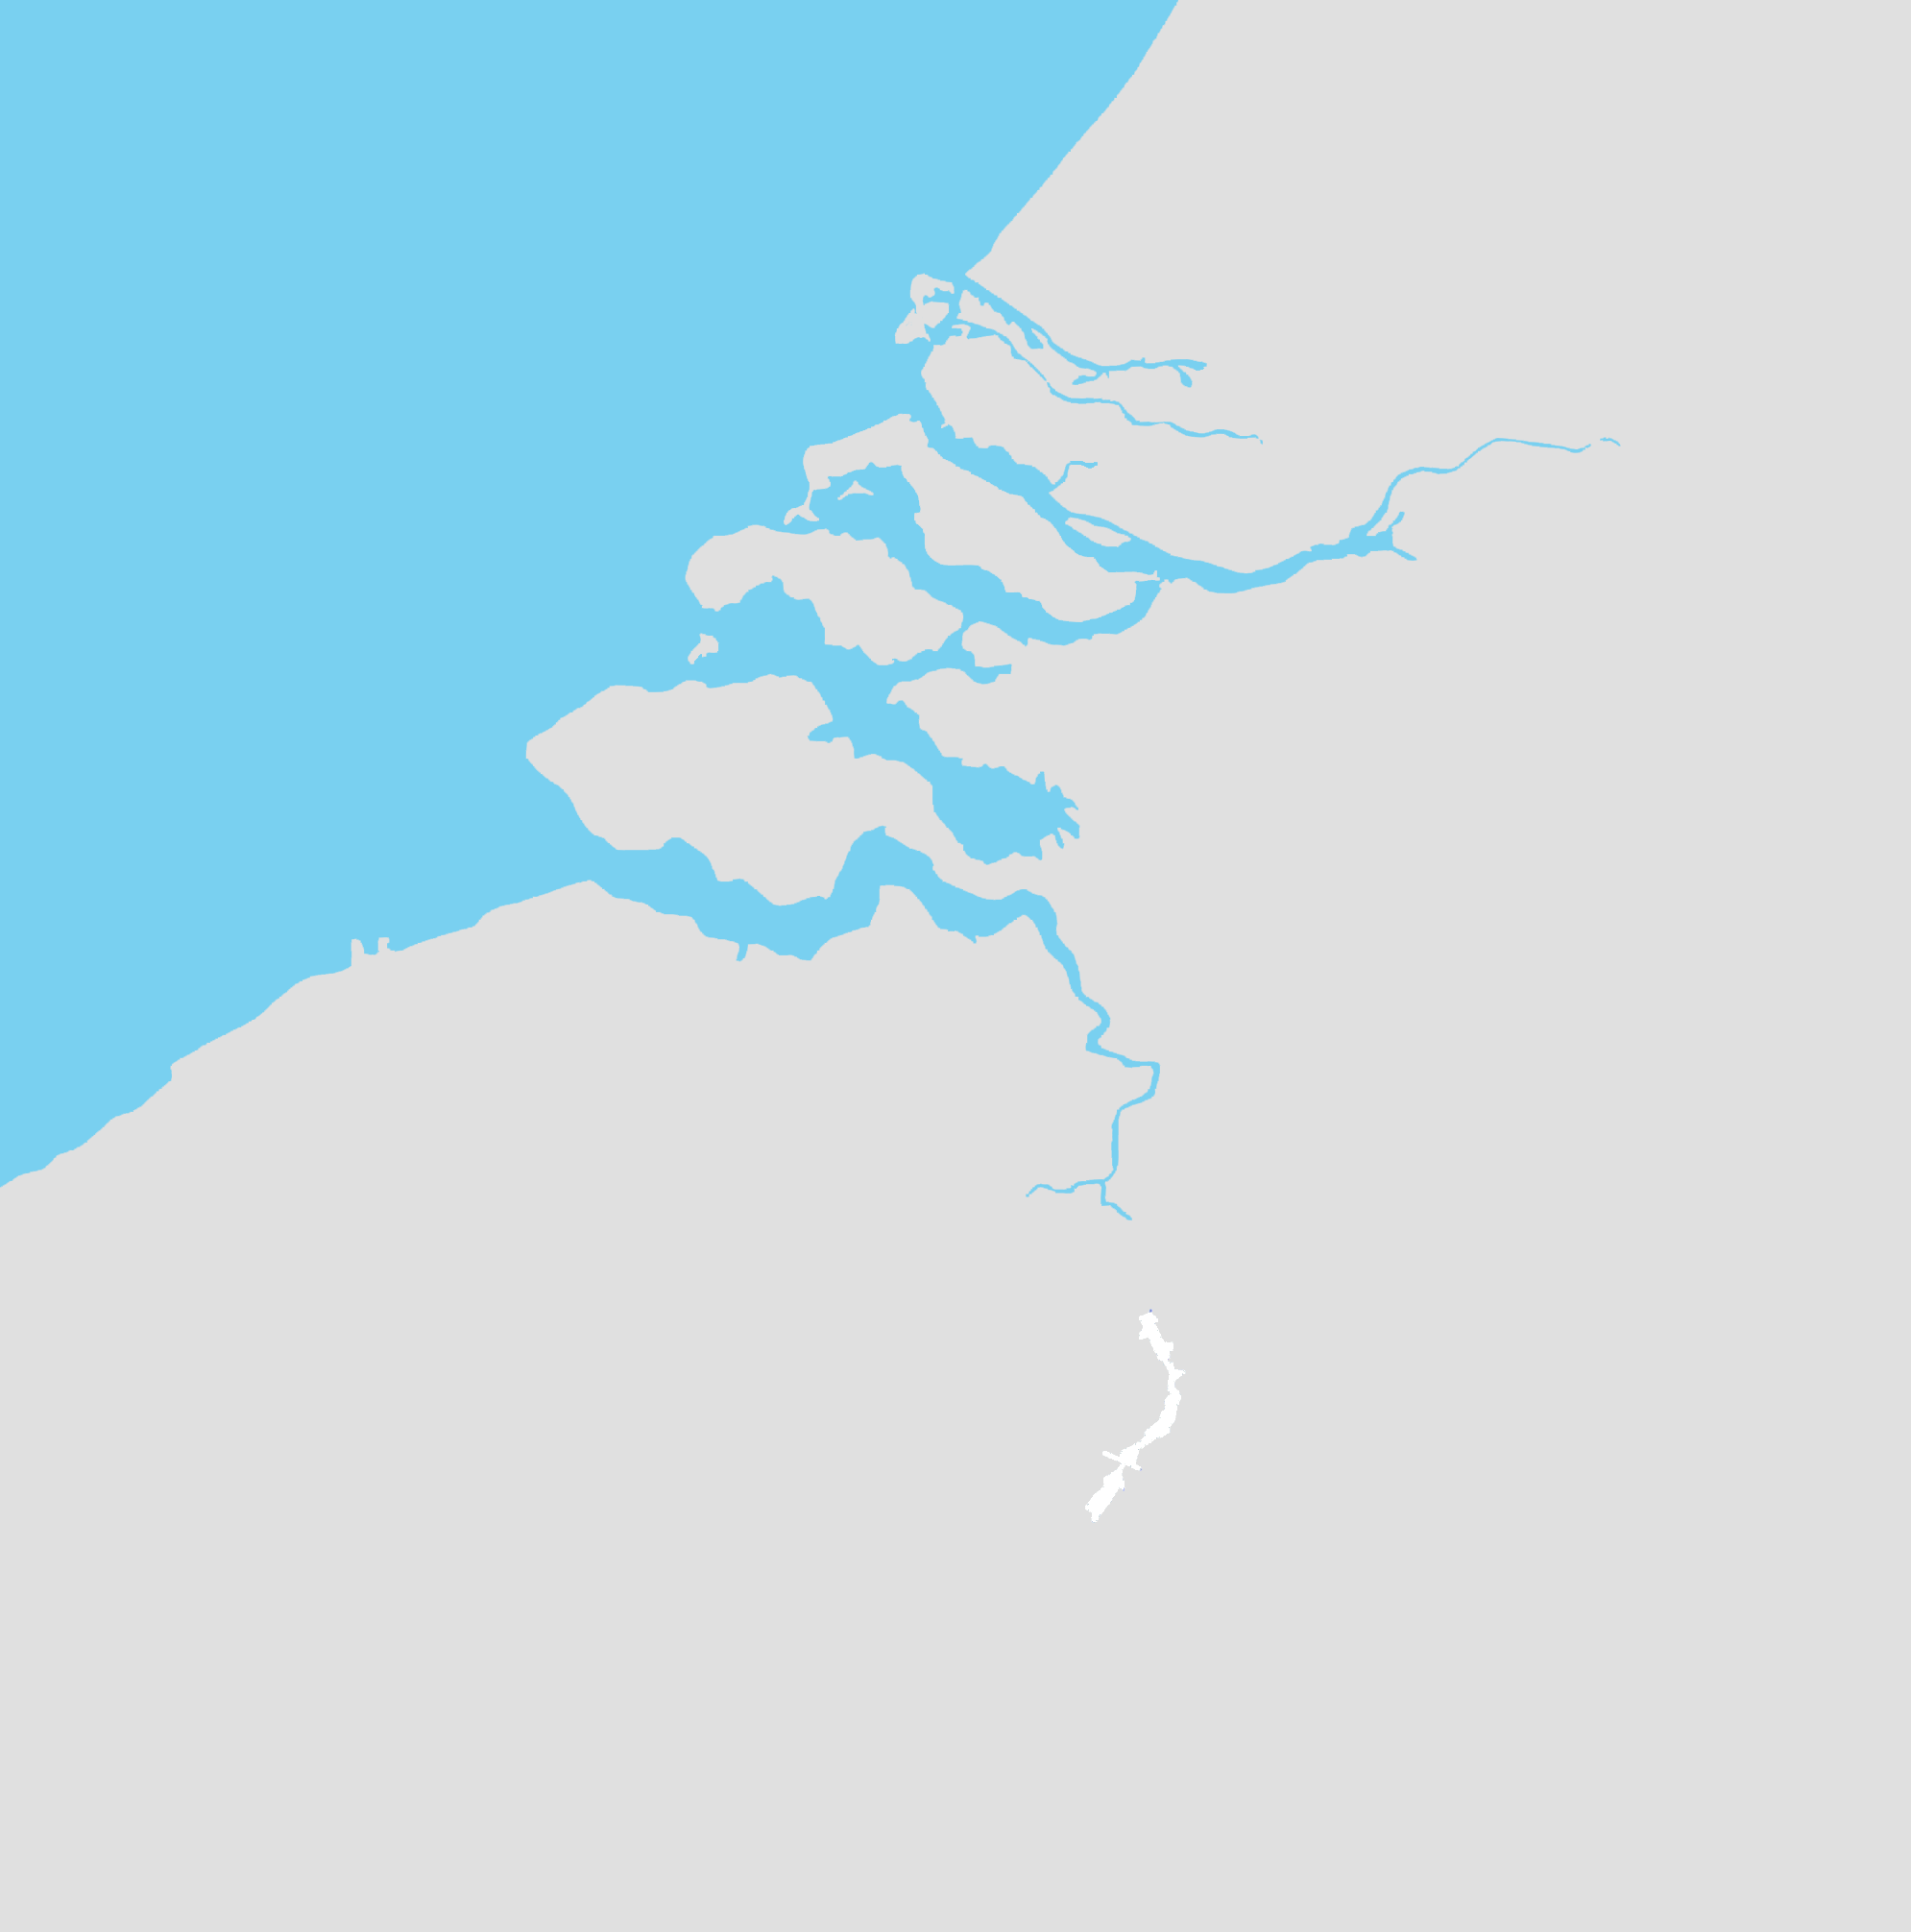 city_location_lage_landen.png